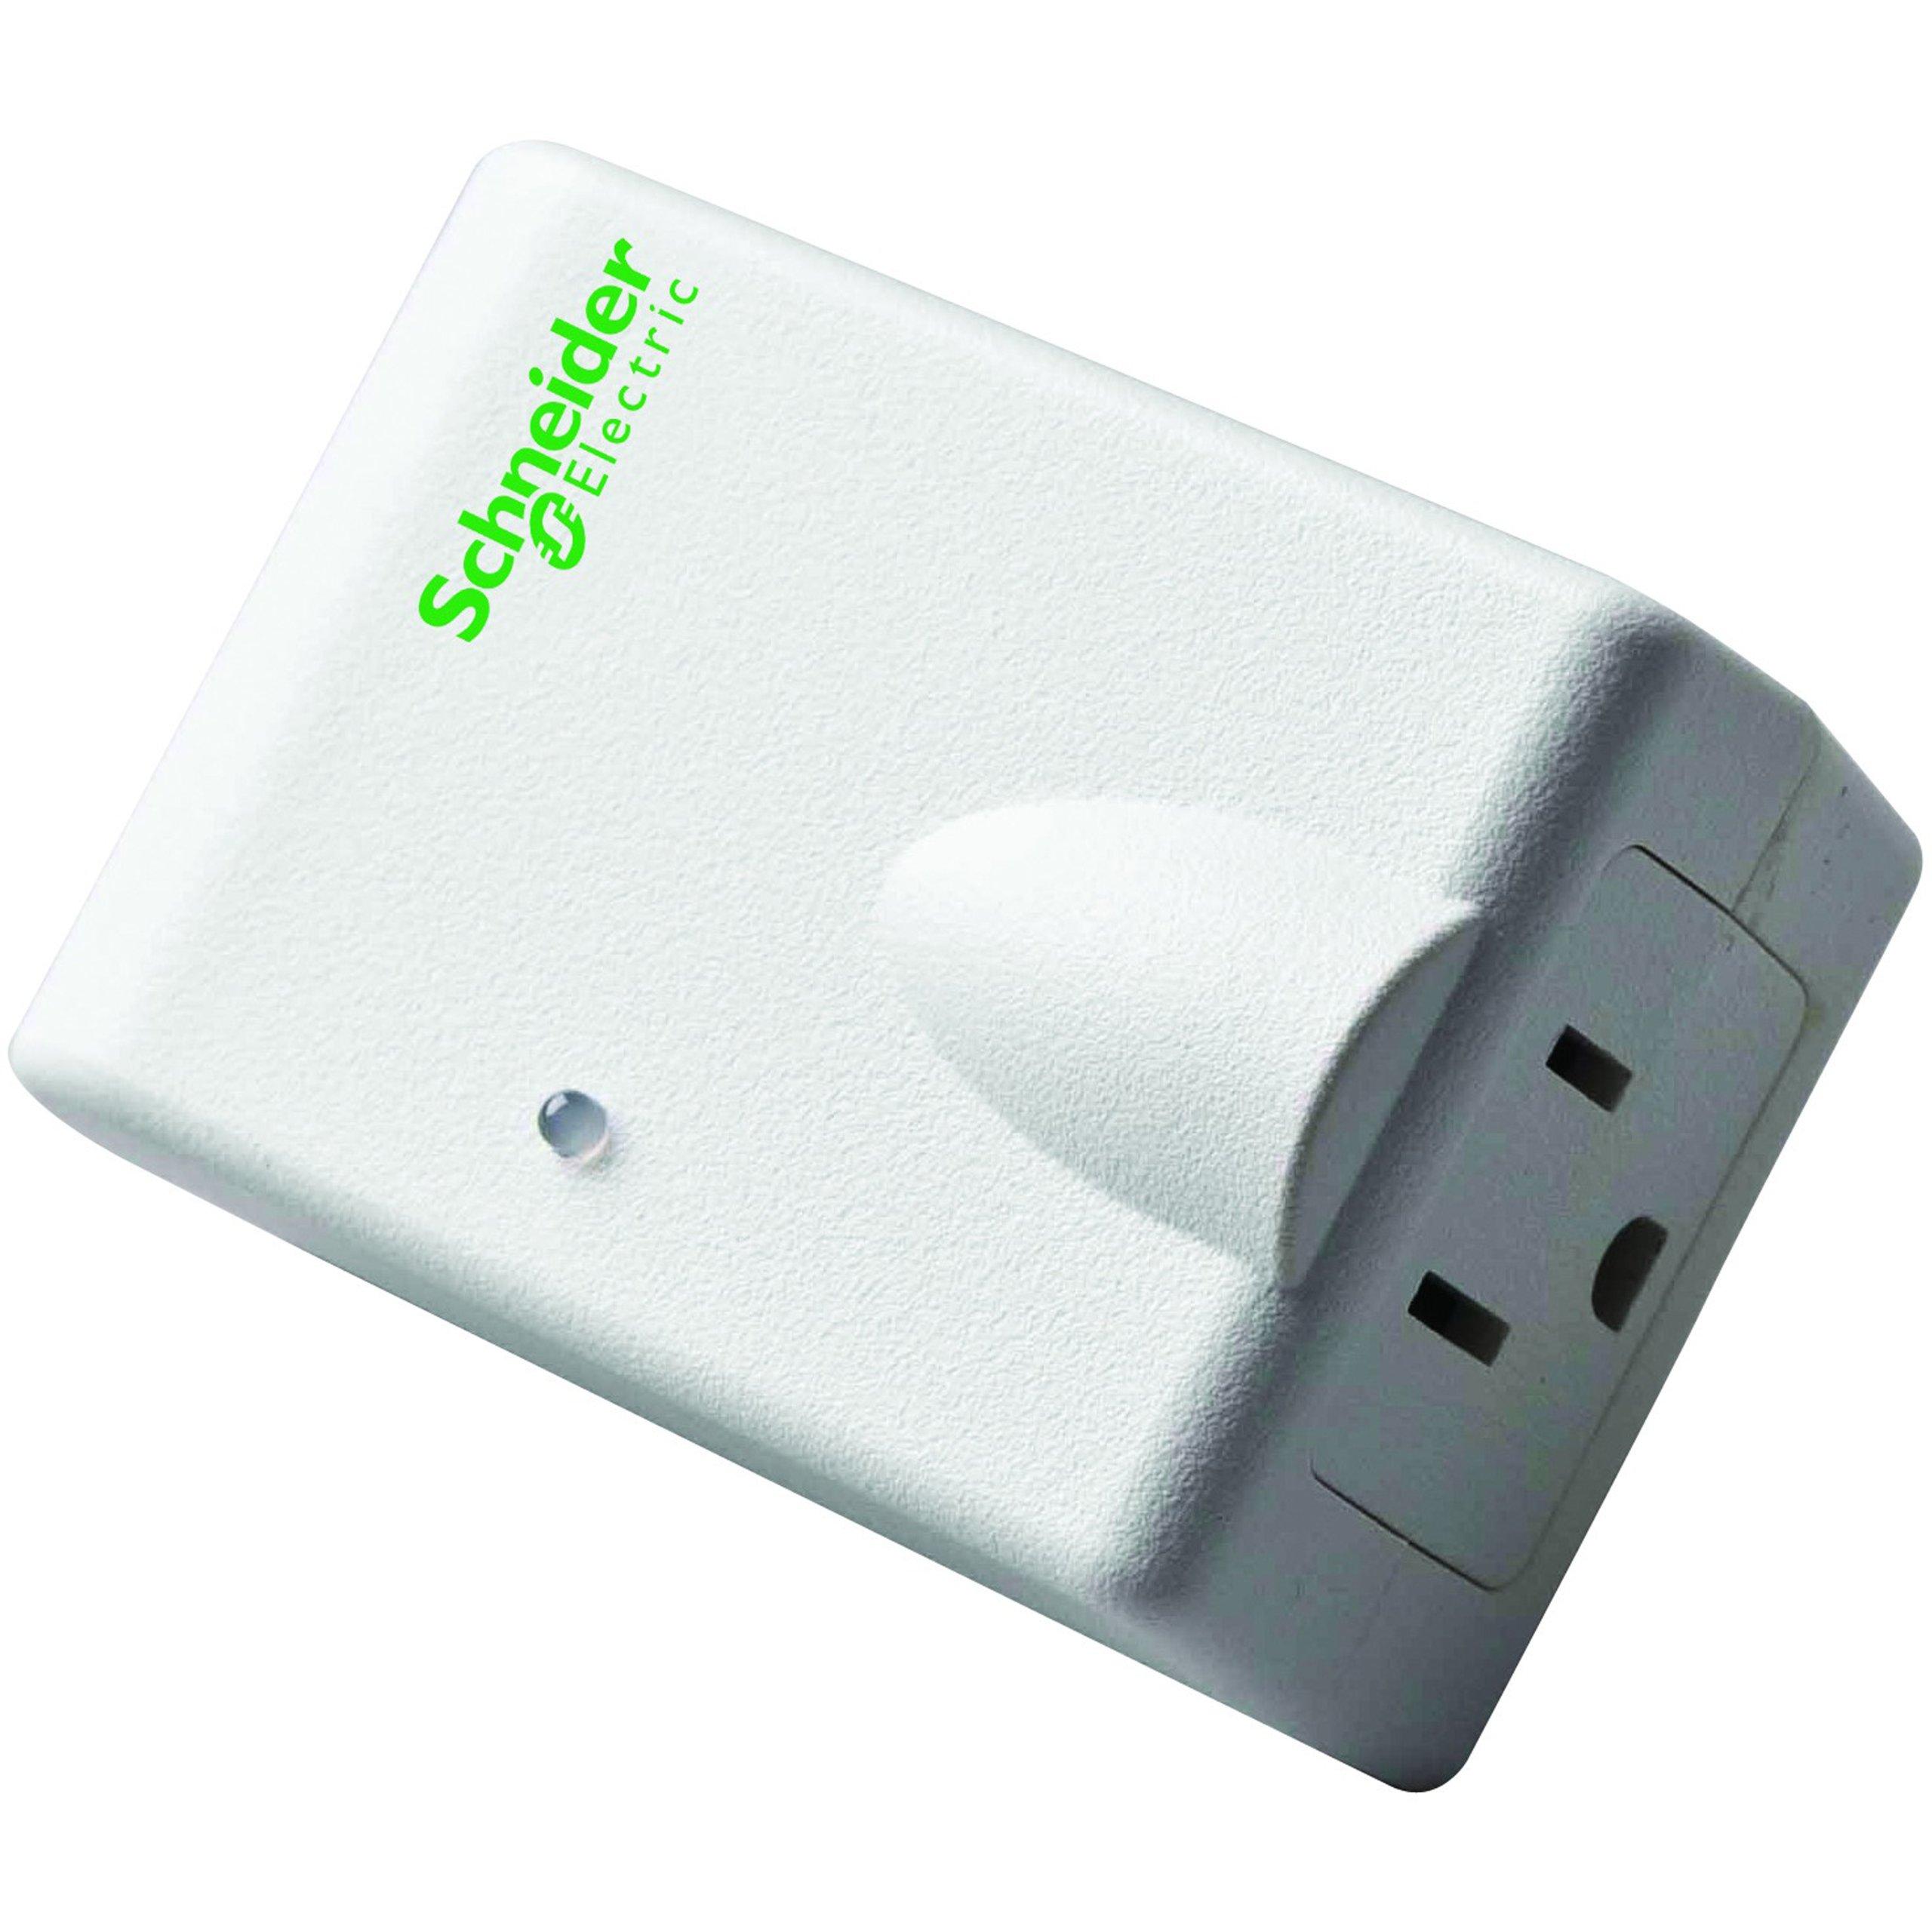 Schneider Electric EER40200 Wiser Smart Plug